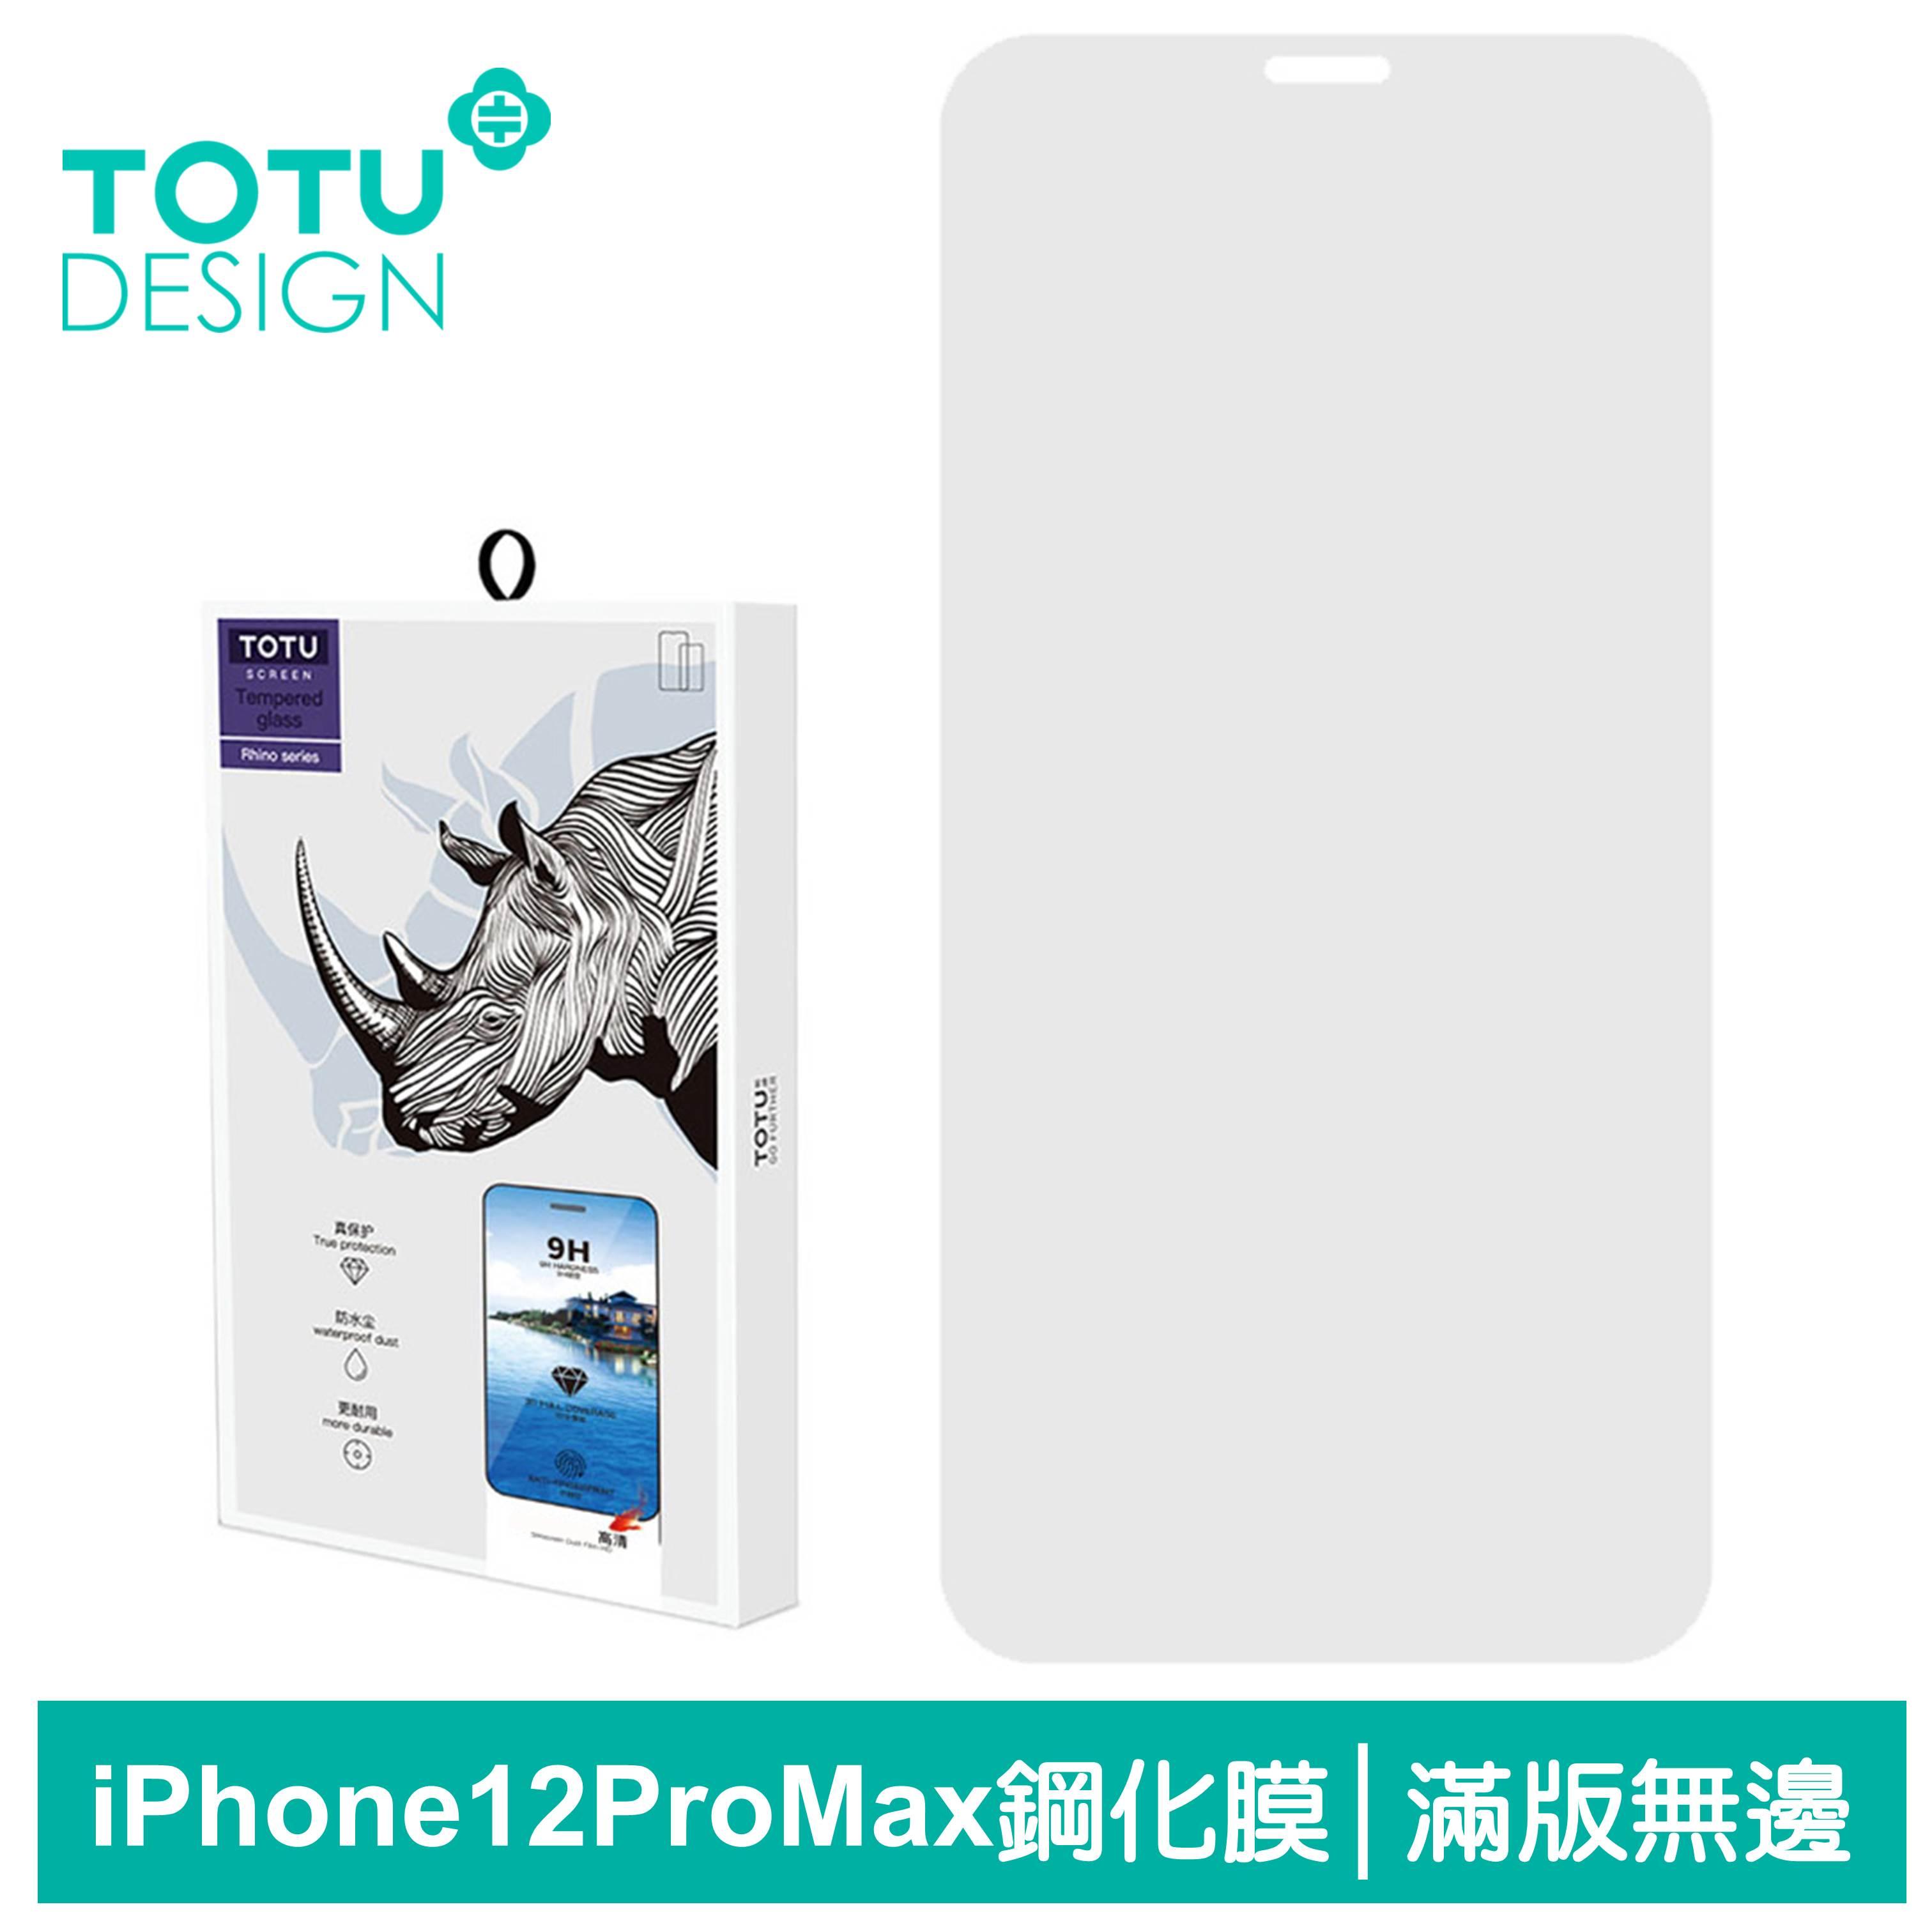 TOTU台灣官方 iPhone 12 Pro Max 鋼化膜 i12ProMax 保護貼 6.7吋 保護膜 滿版高清無邊 犀牛家族